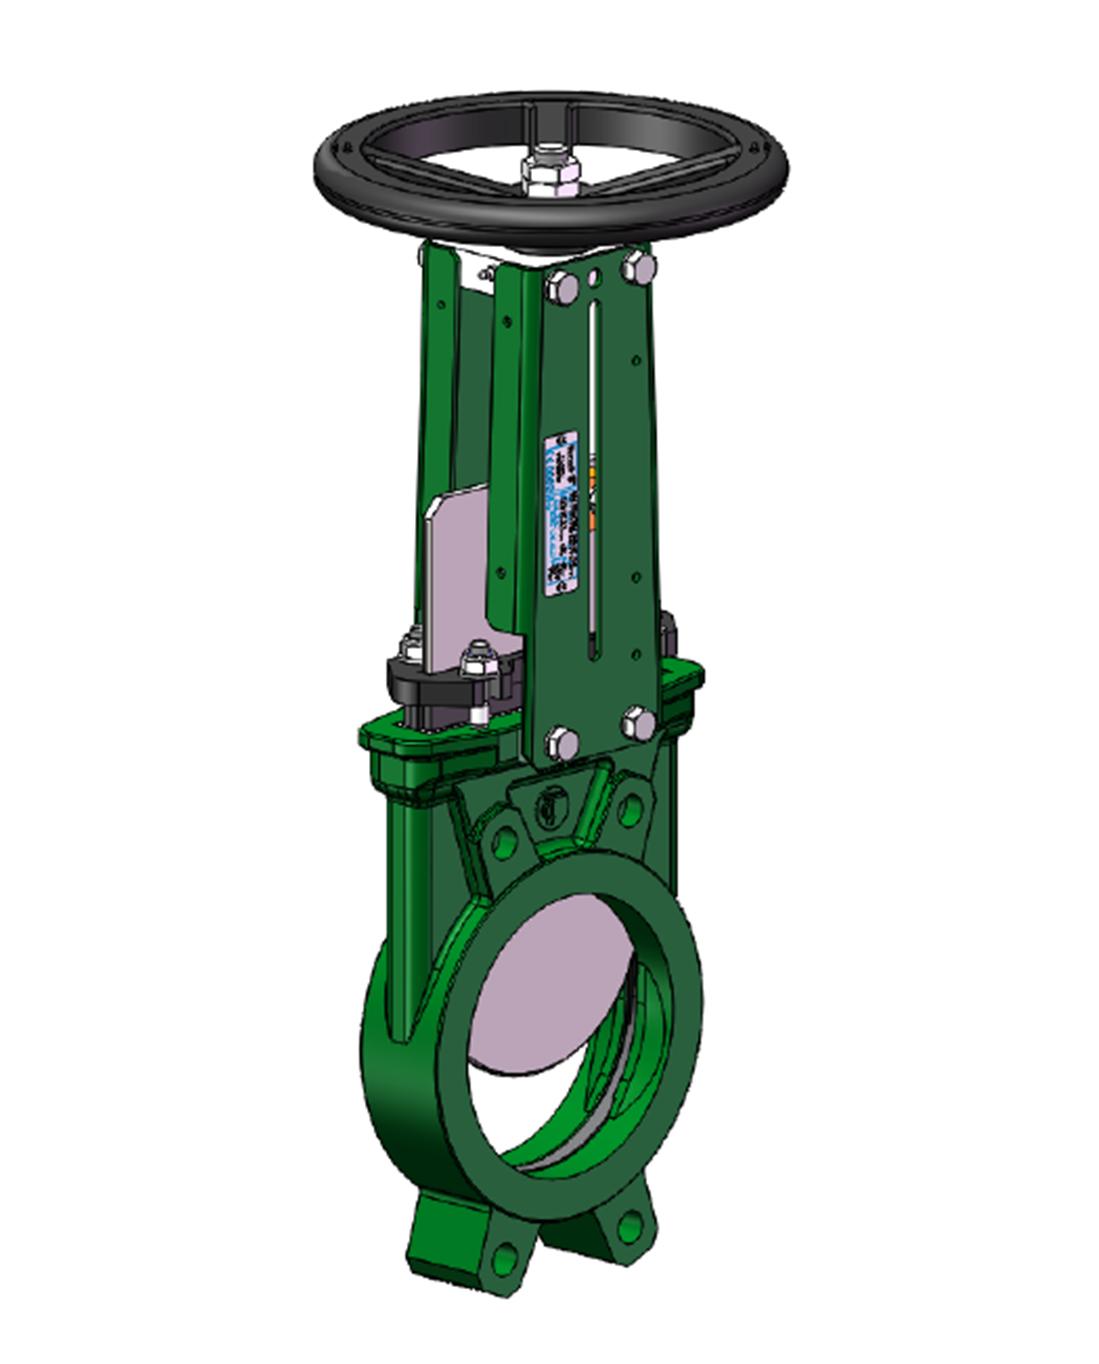 Valvula guillotina bidireccional  – cuerpo hierro fundido- acero inoxidable 304 gate – no ascendente Volante -serie 20